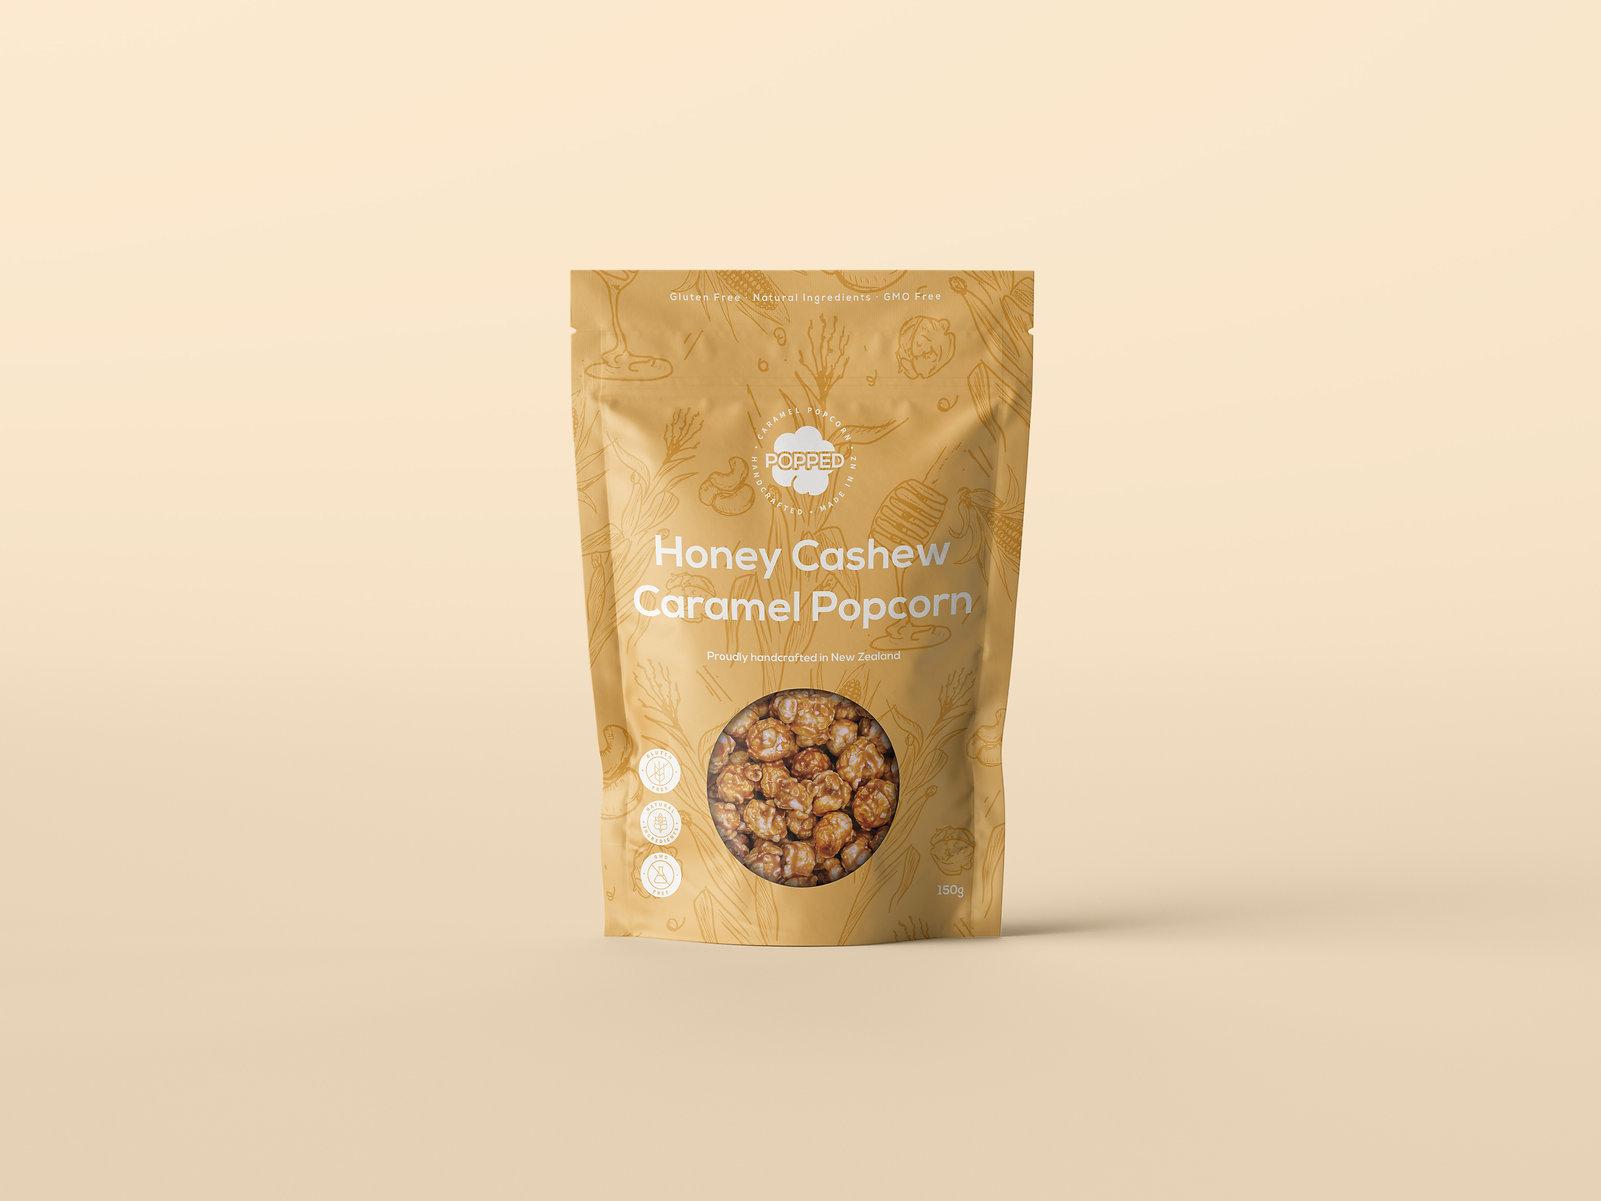 Mockup_Honey-Cashew-front.jpg